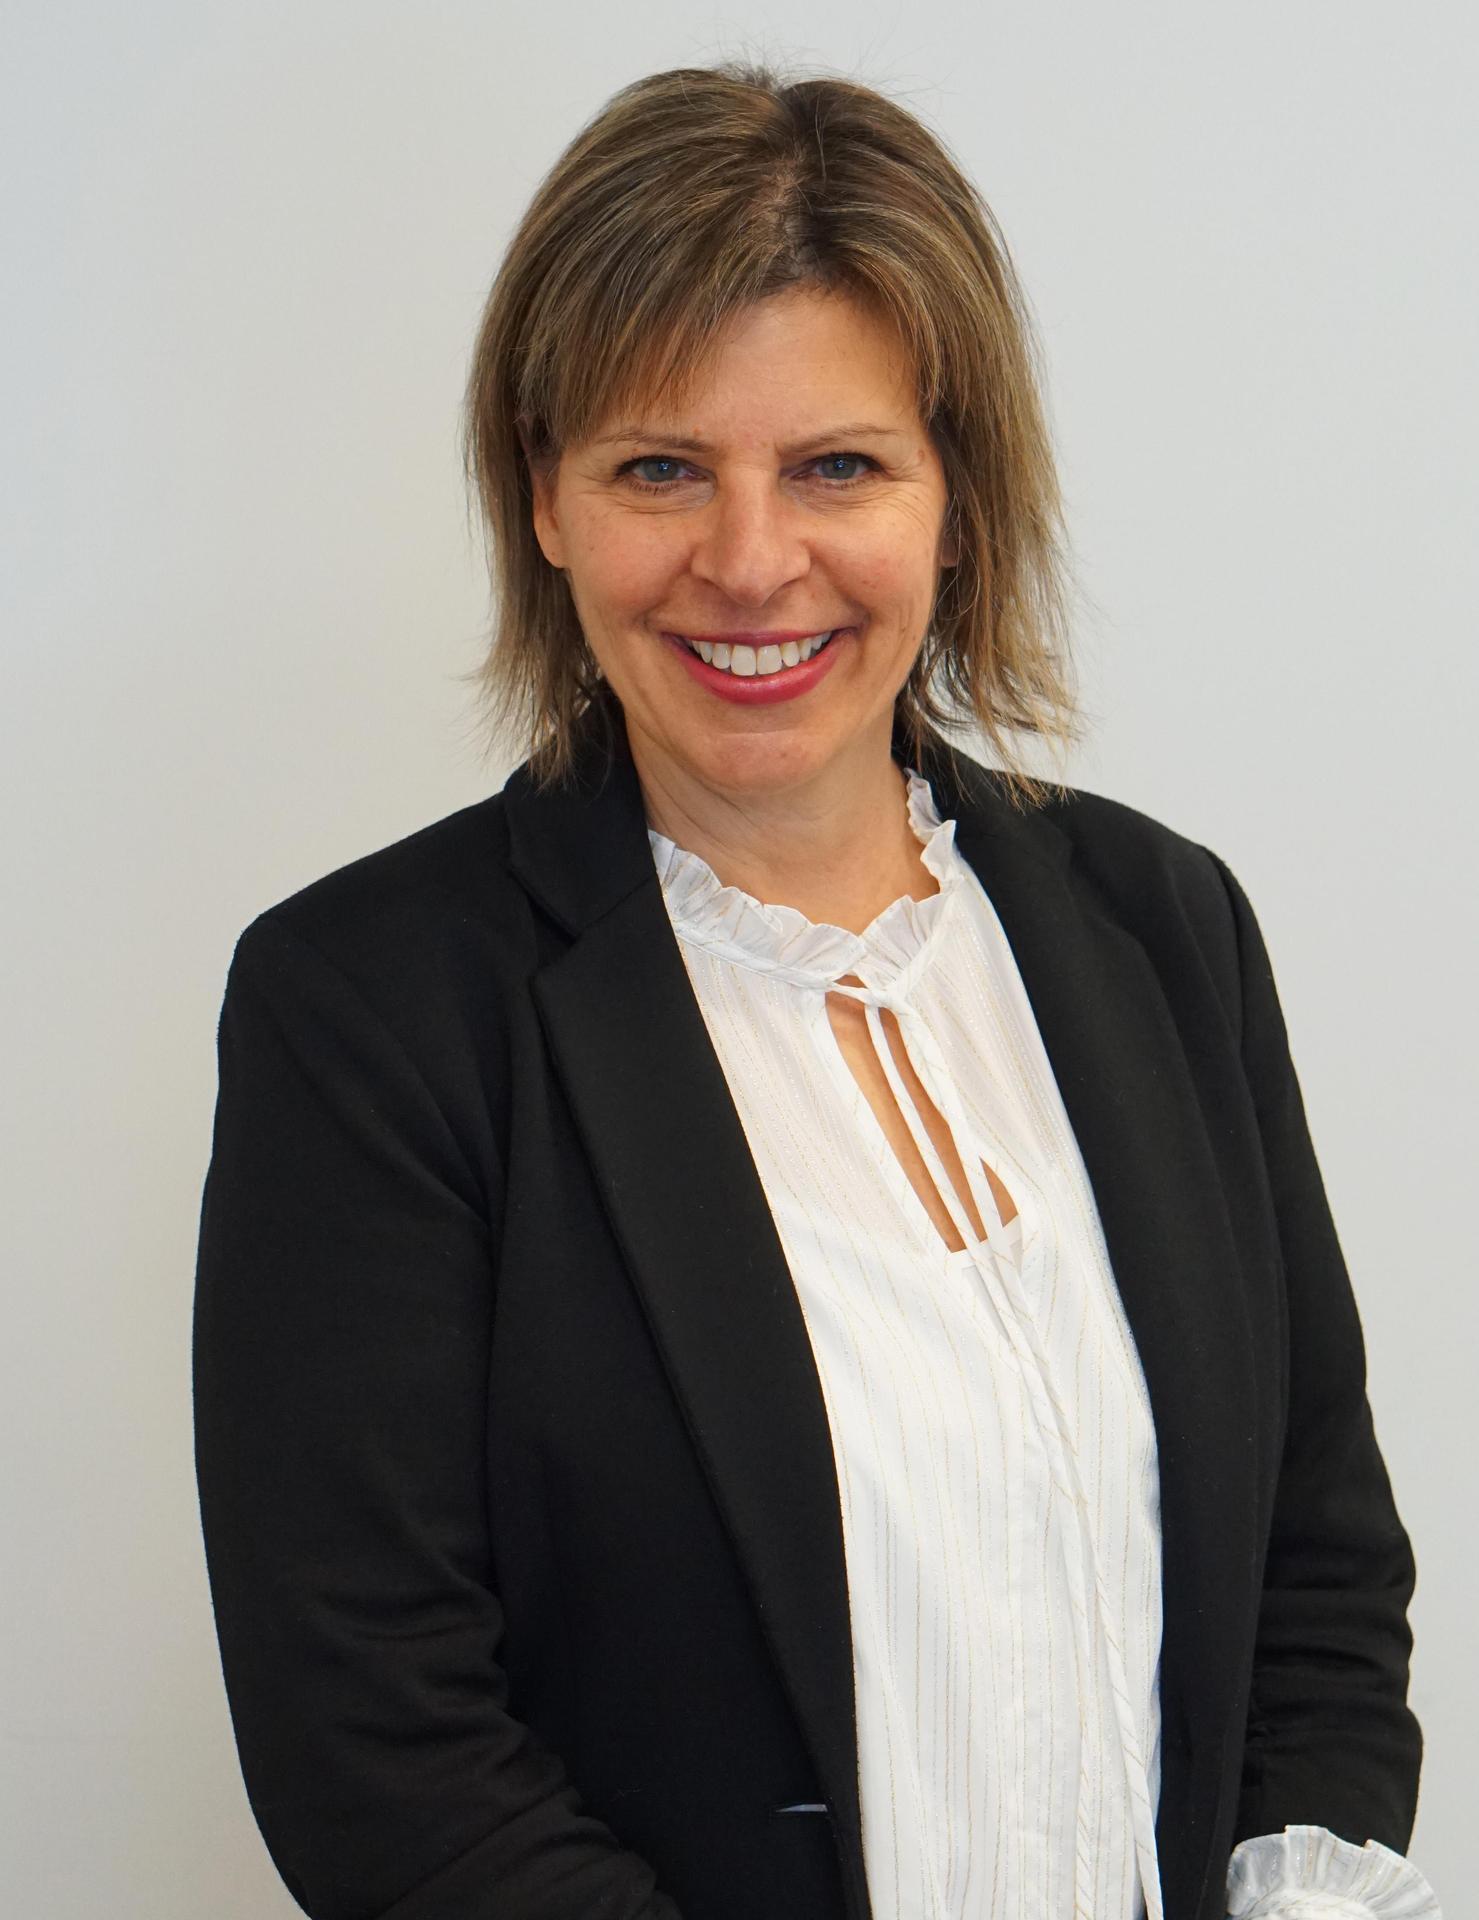 Headshot of Lisa Walsh